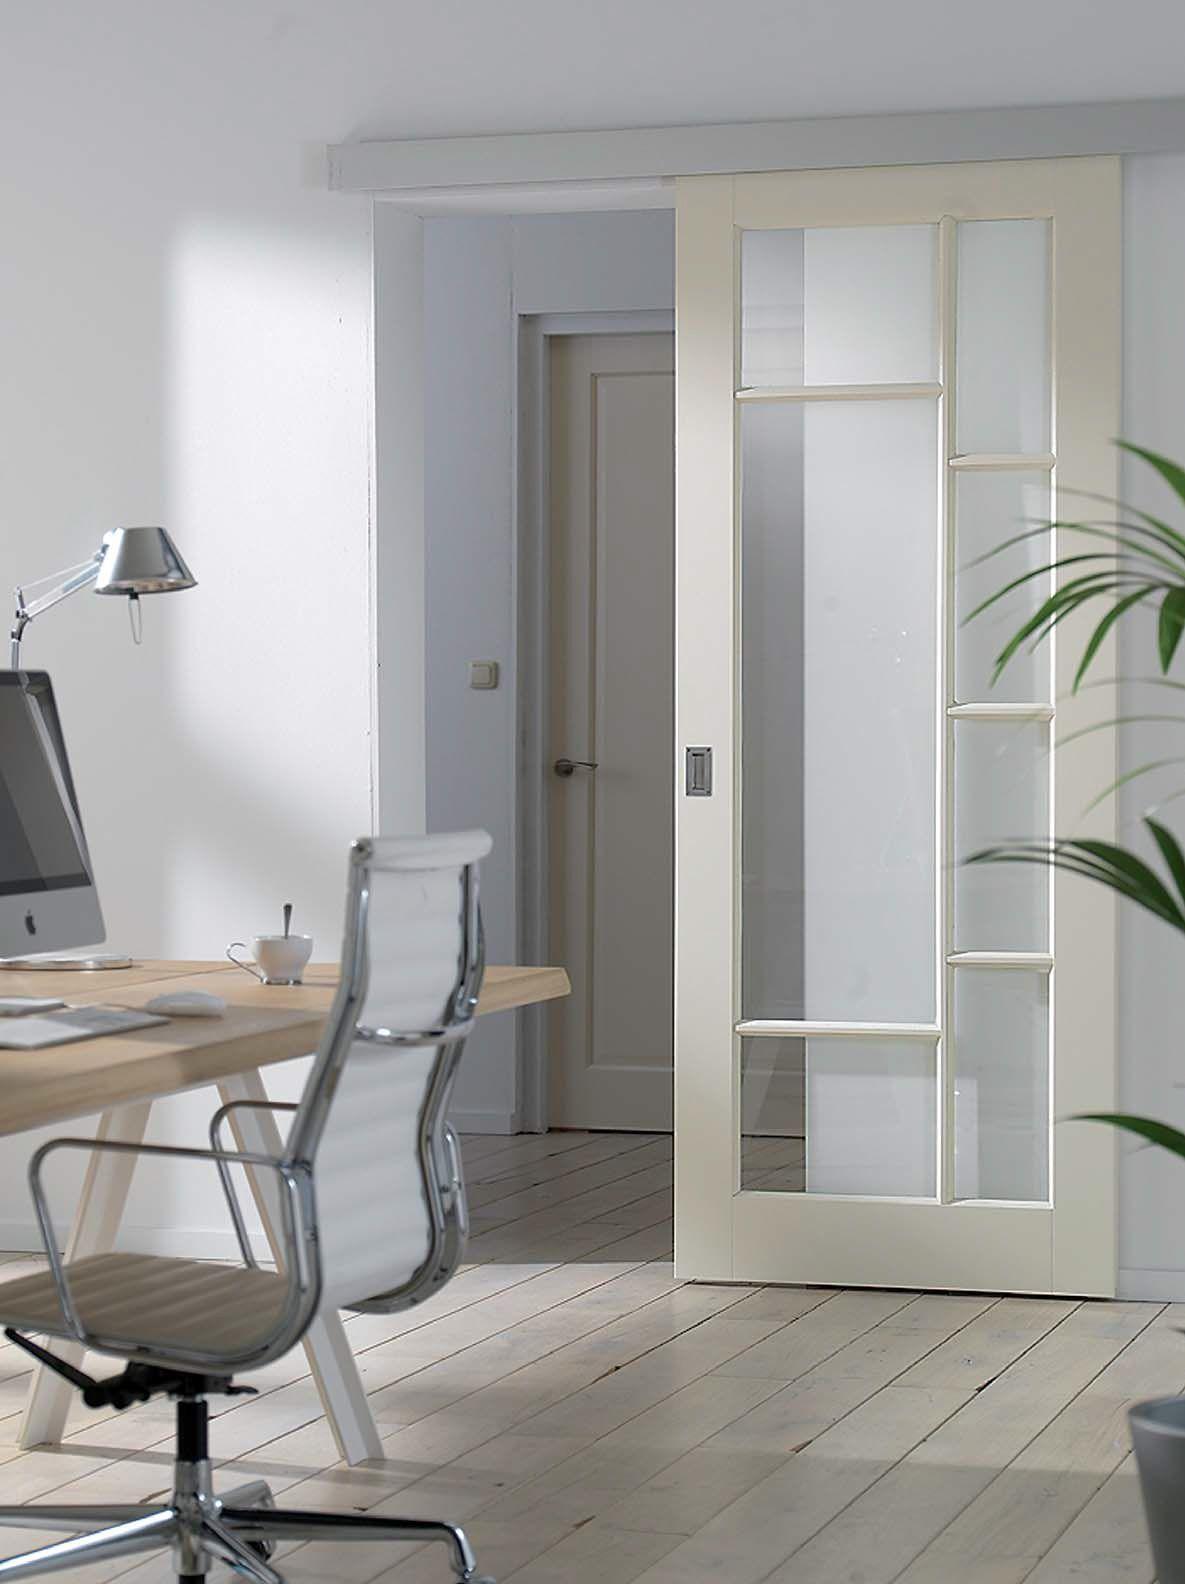 Sliding Door Hardware - Brings an elegant silent sliding mechanism to heavier entrance doors and room & Sliding Door Hardware - Brings an elegant silent sliding mechanism ...